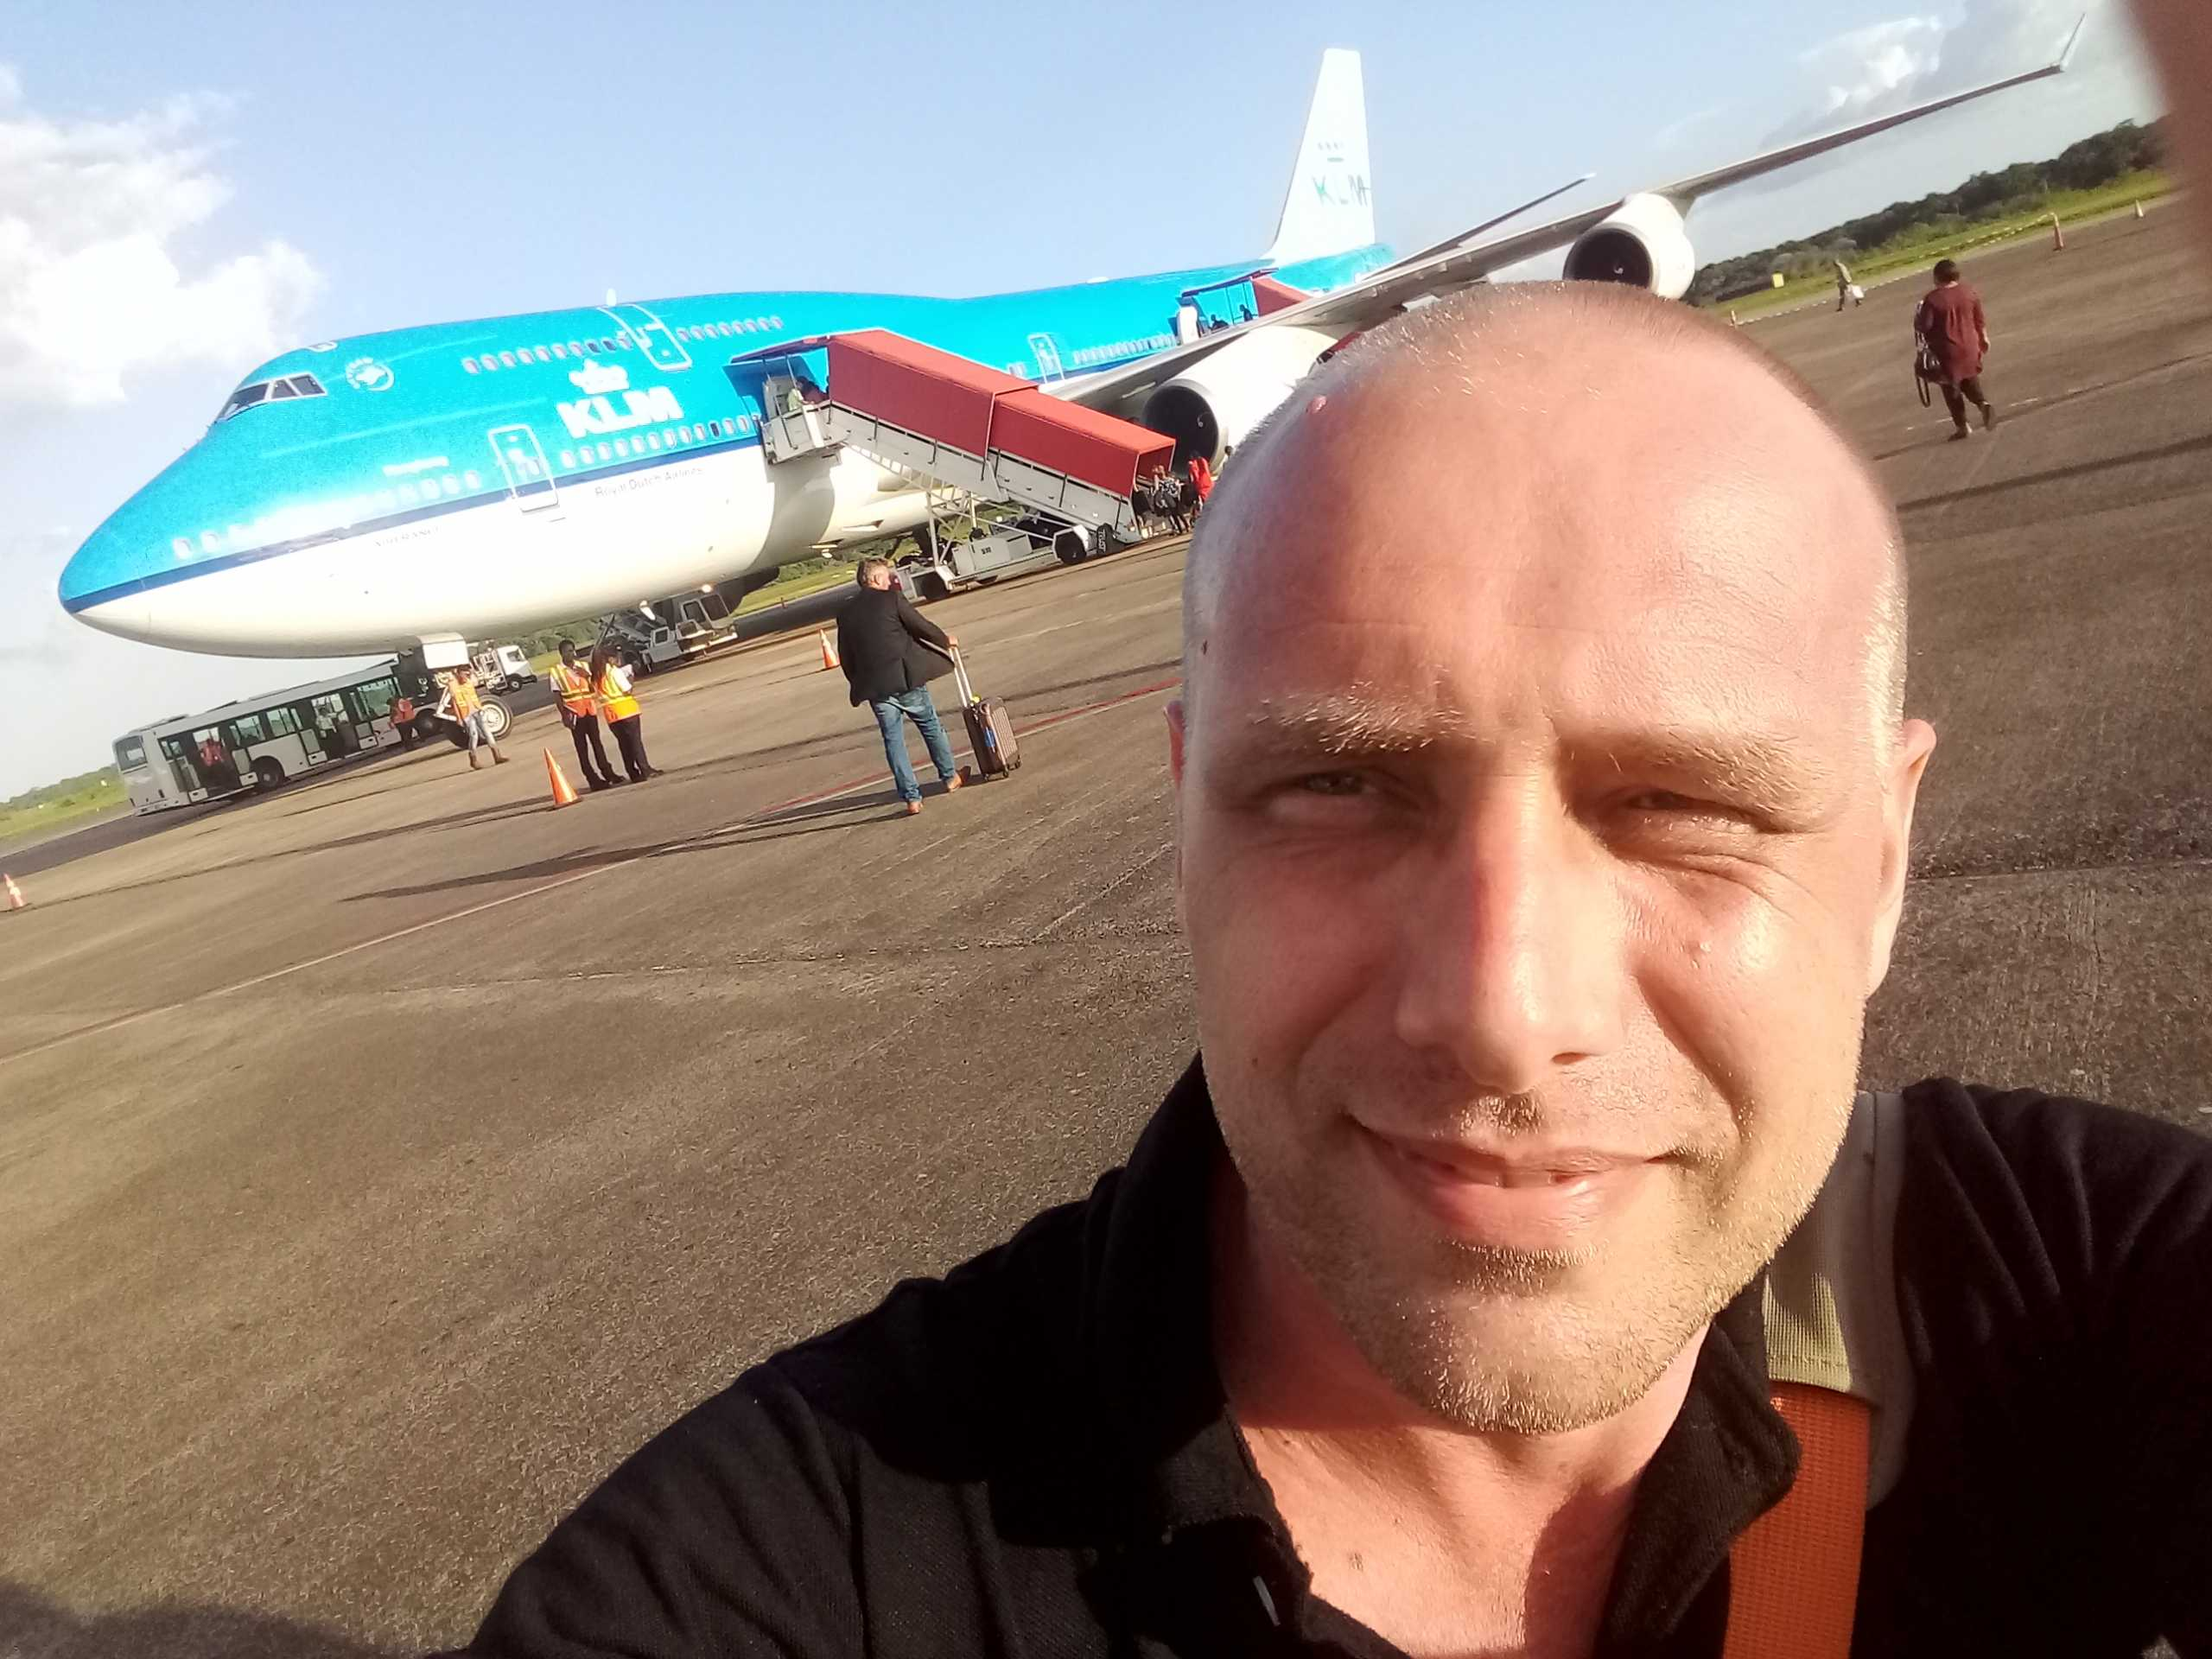 Dag expat life, tot ziens Caribbean, hallo Nederland!